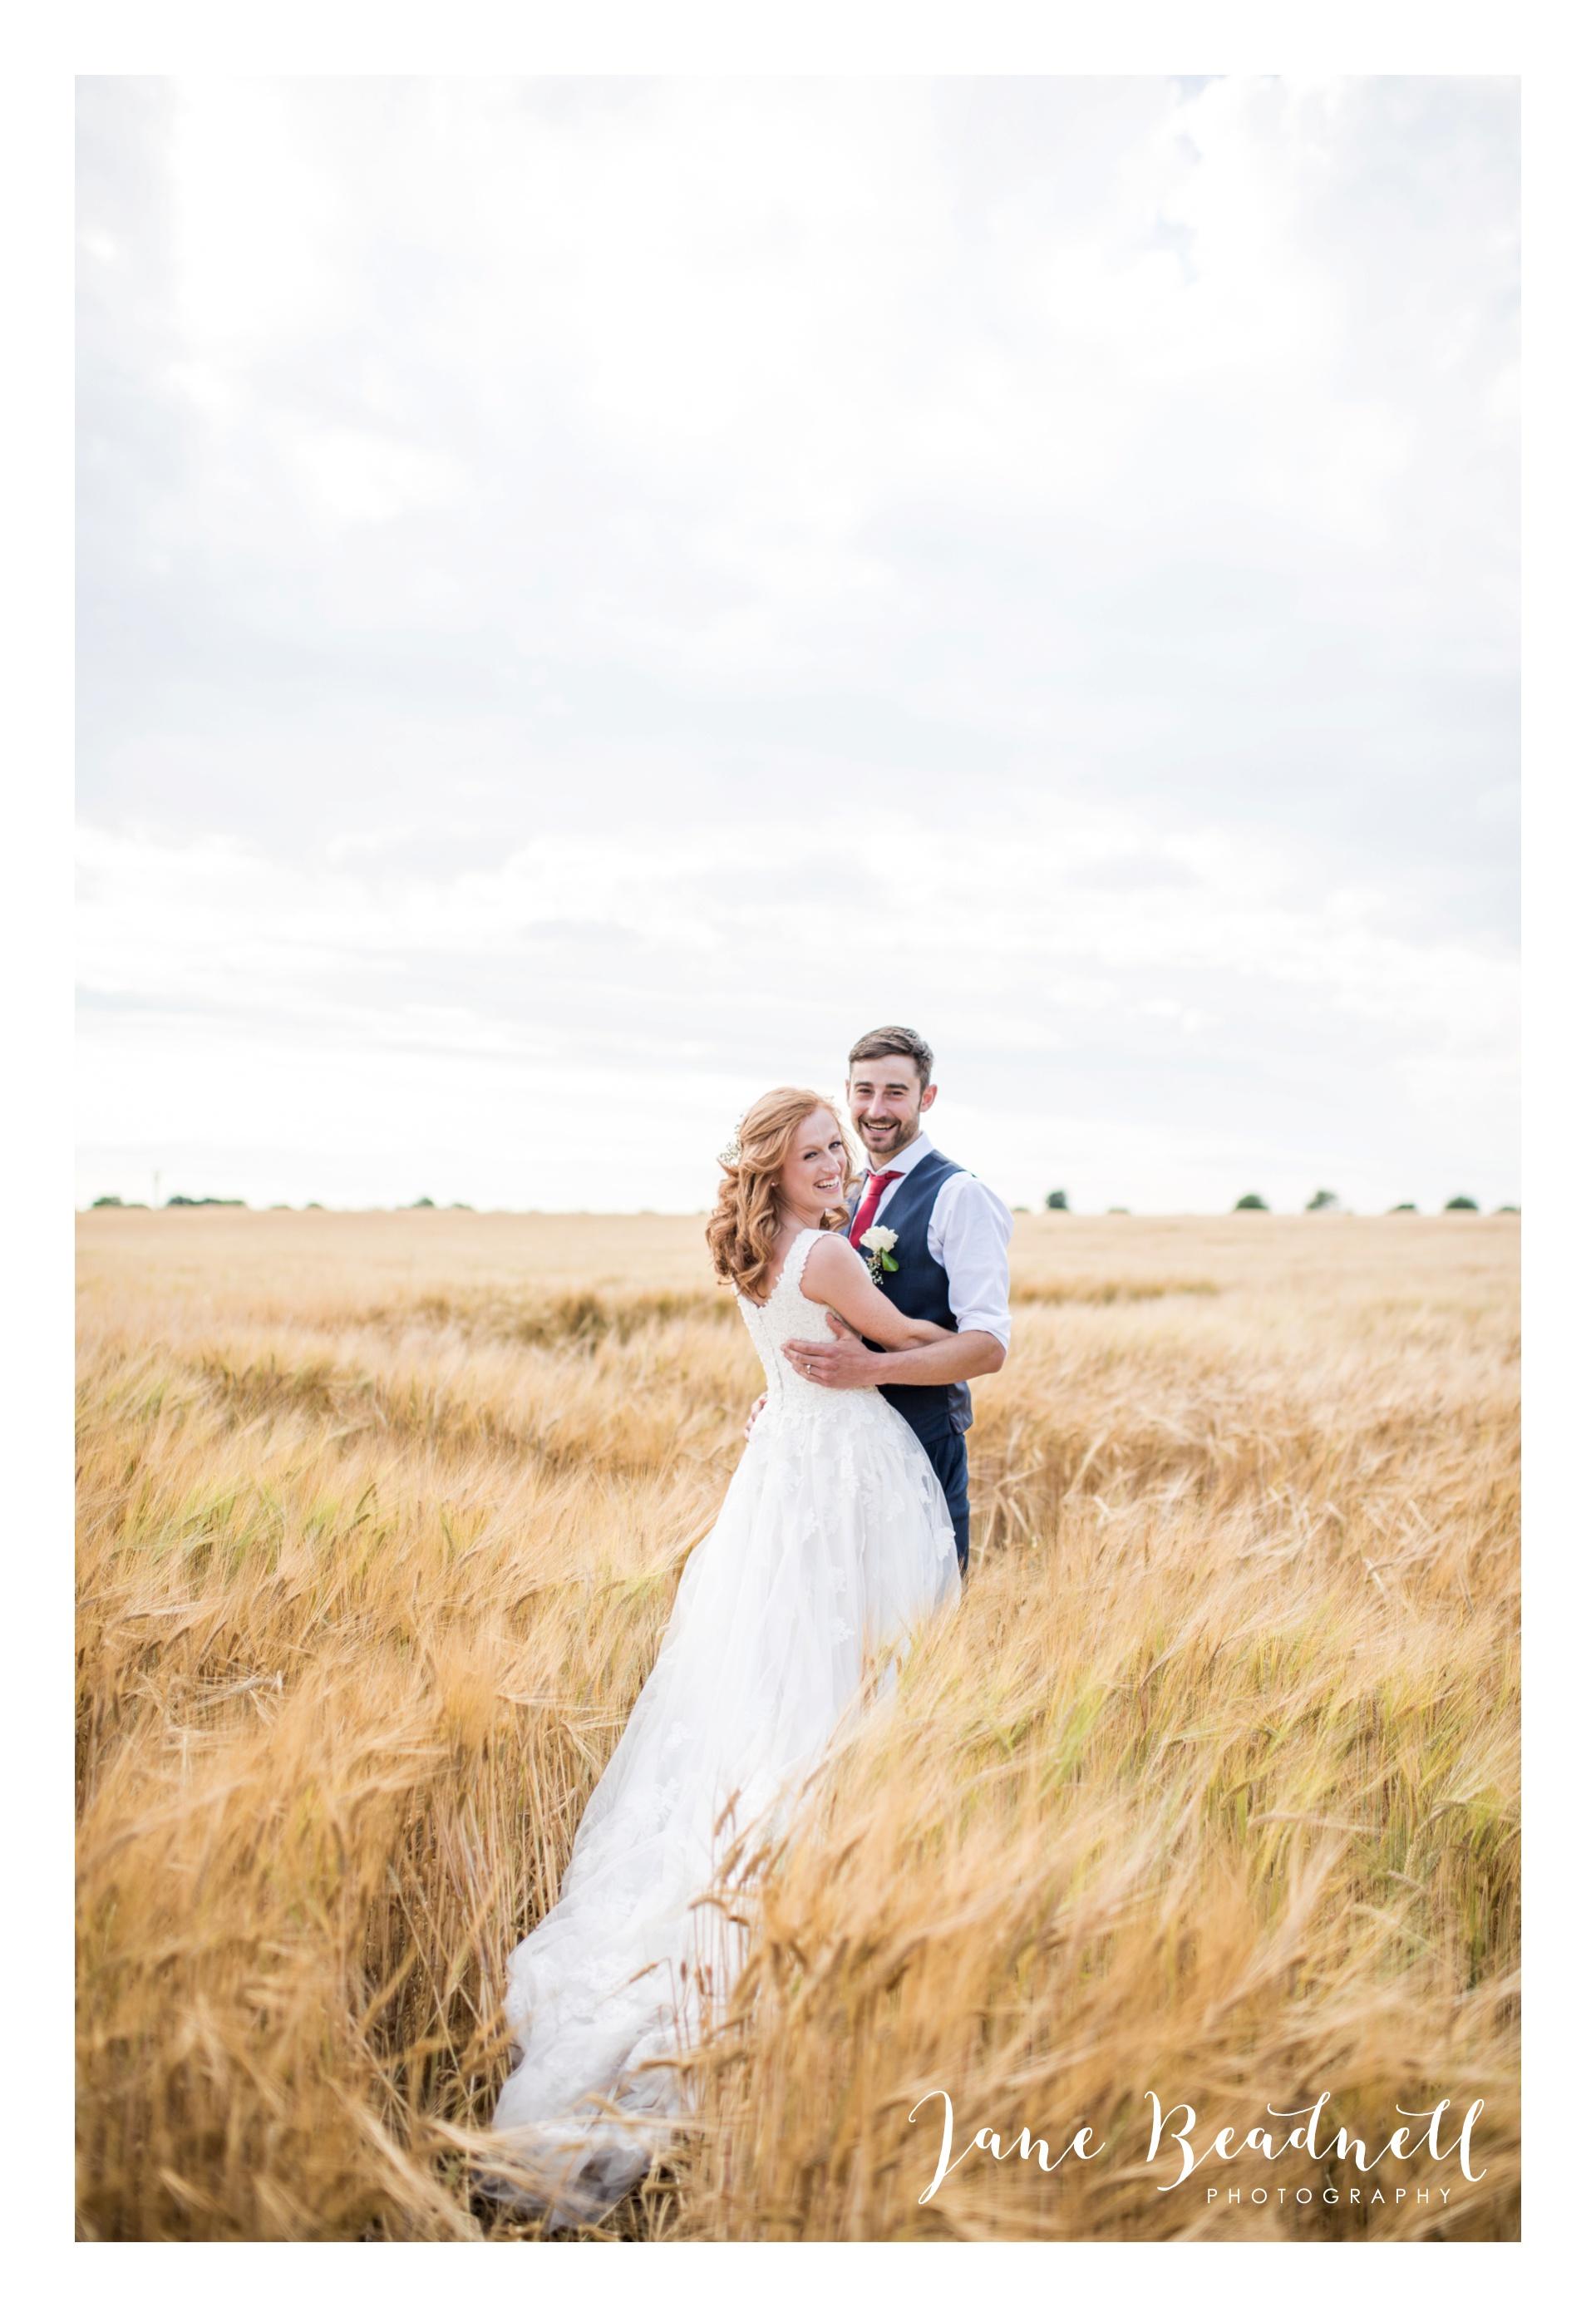 yorkshire-fine-art-wedding-photographer-jane-beadnell-photography-poppleton-york_0130